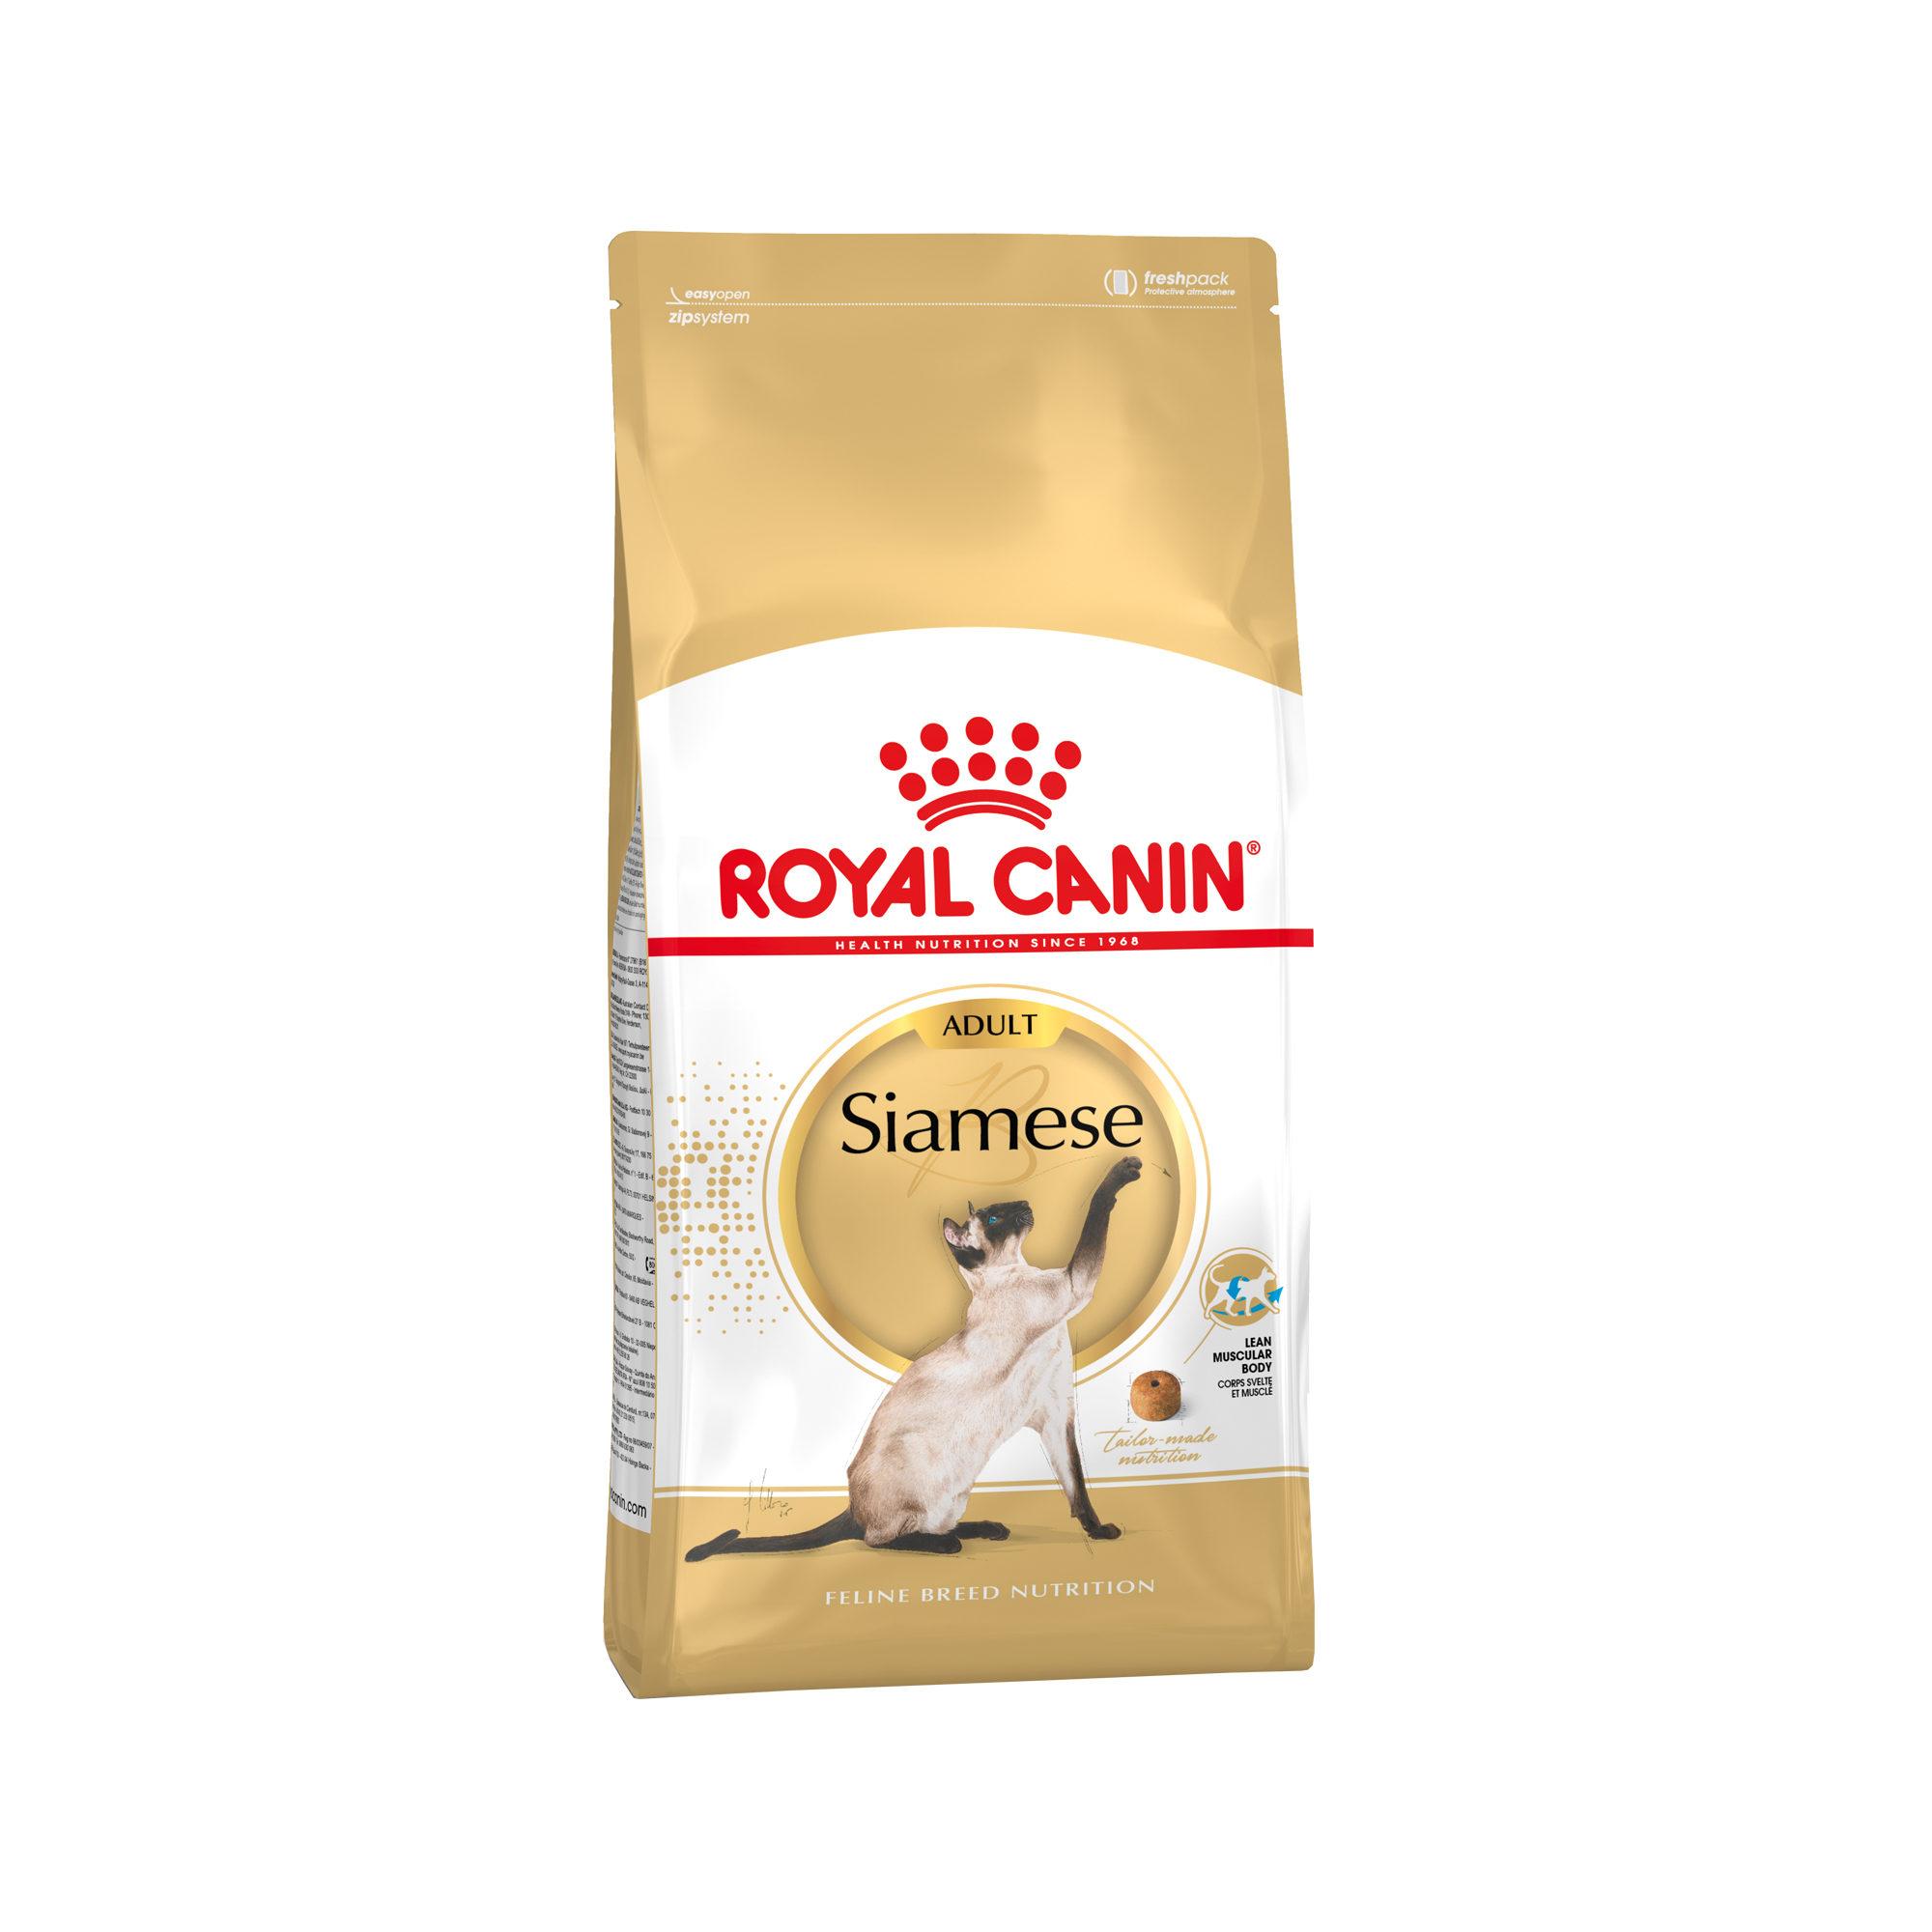 Royal Canin Siamese Adult Katzenfutter